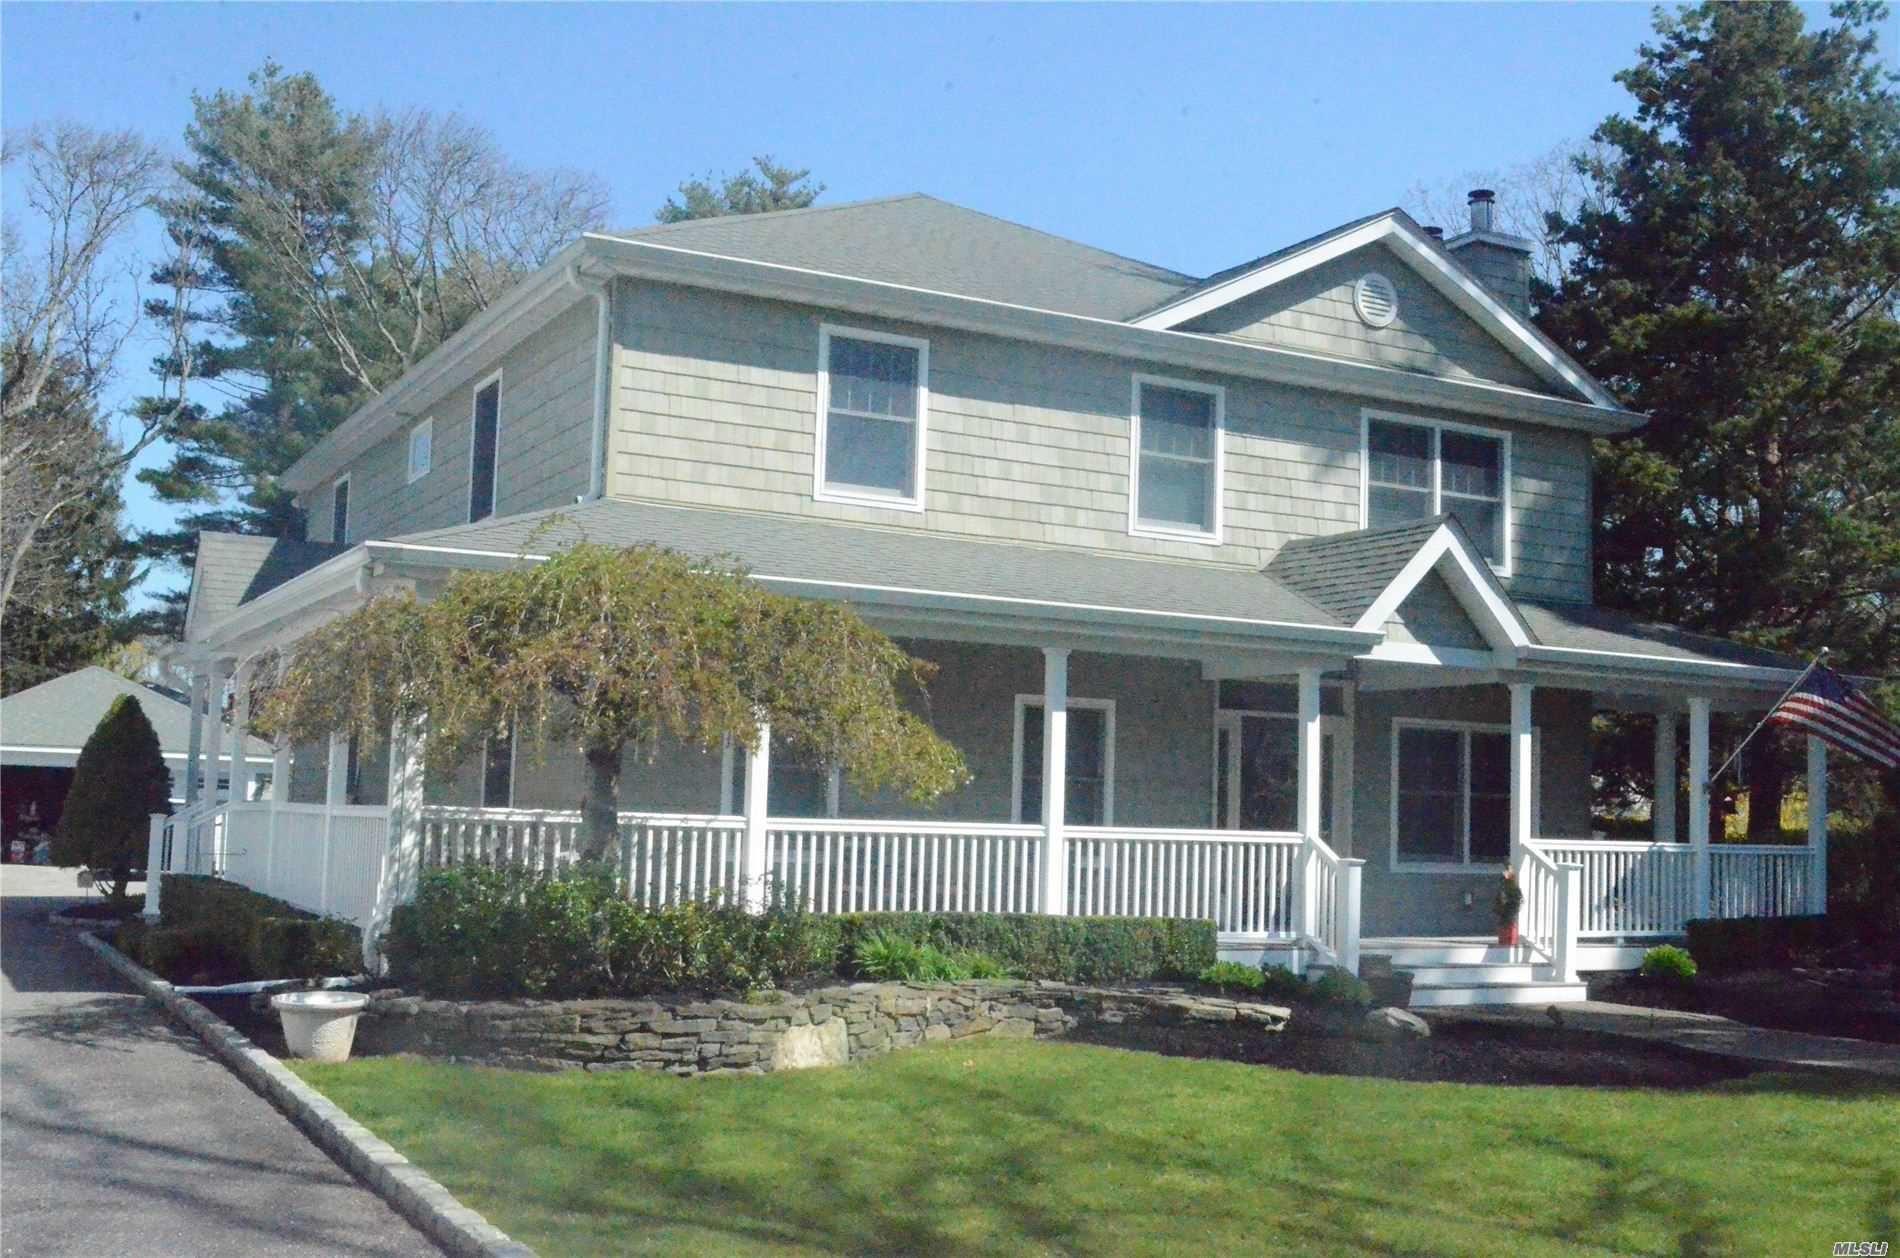 77 Ferndale Ave, Selden, NY 11784 - MLS#: 3212234